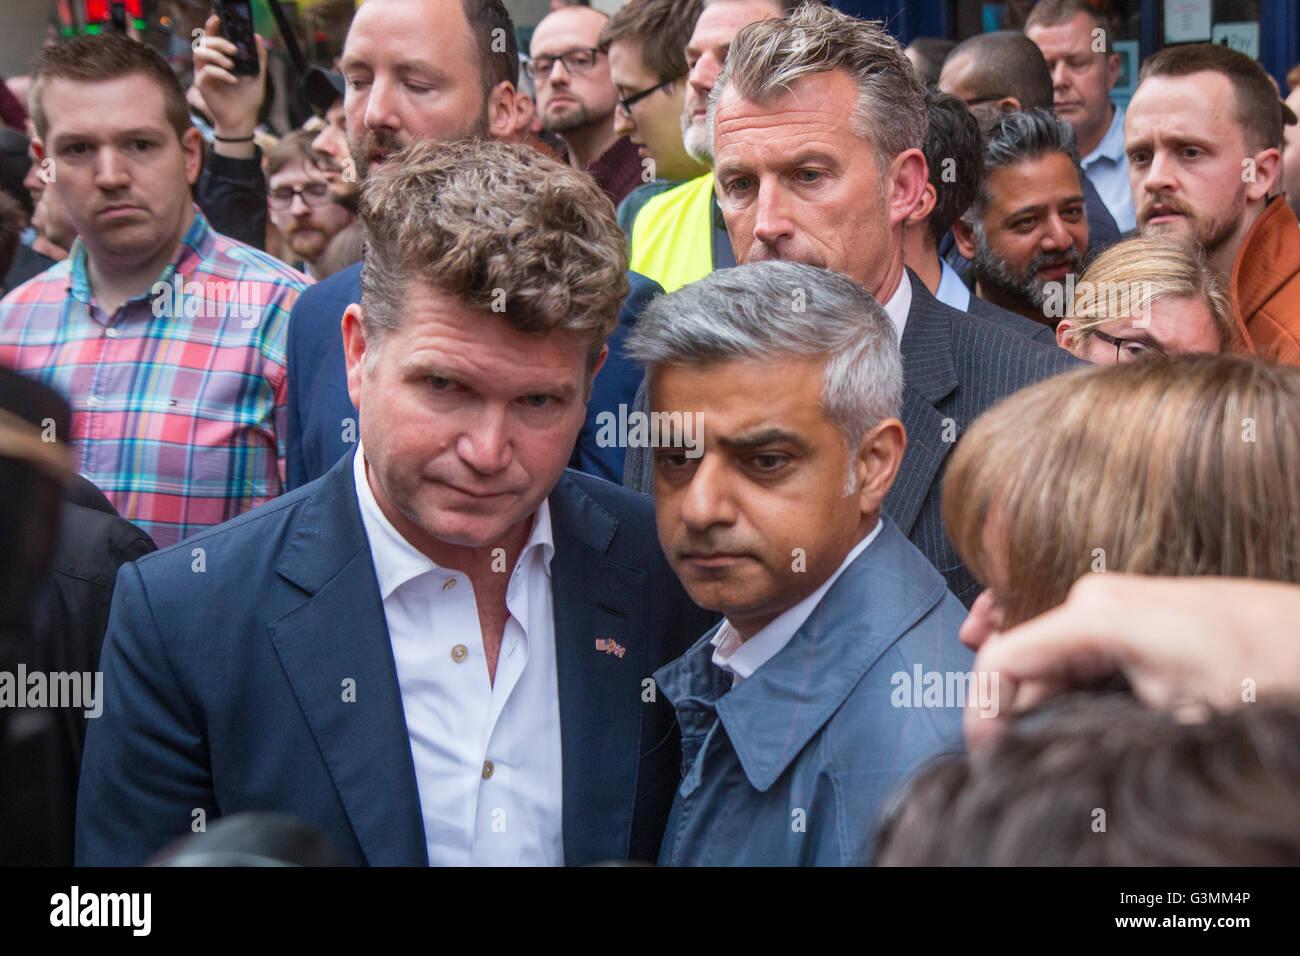 US Embassador and Mayor of London - Stock Image